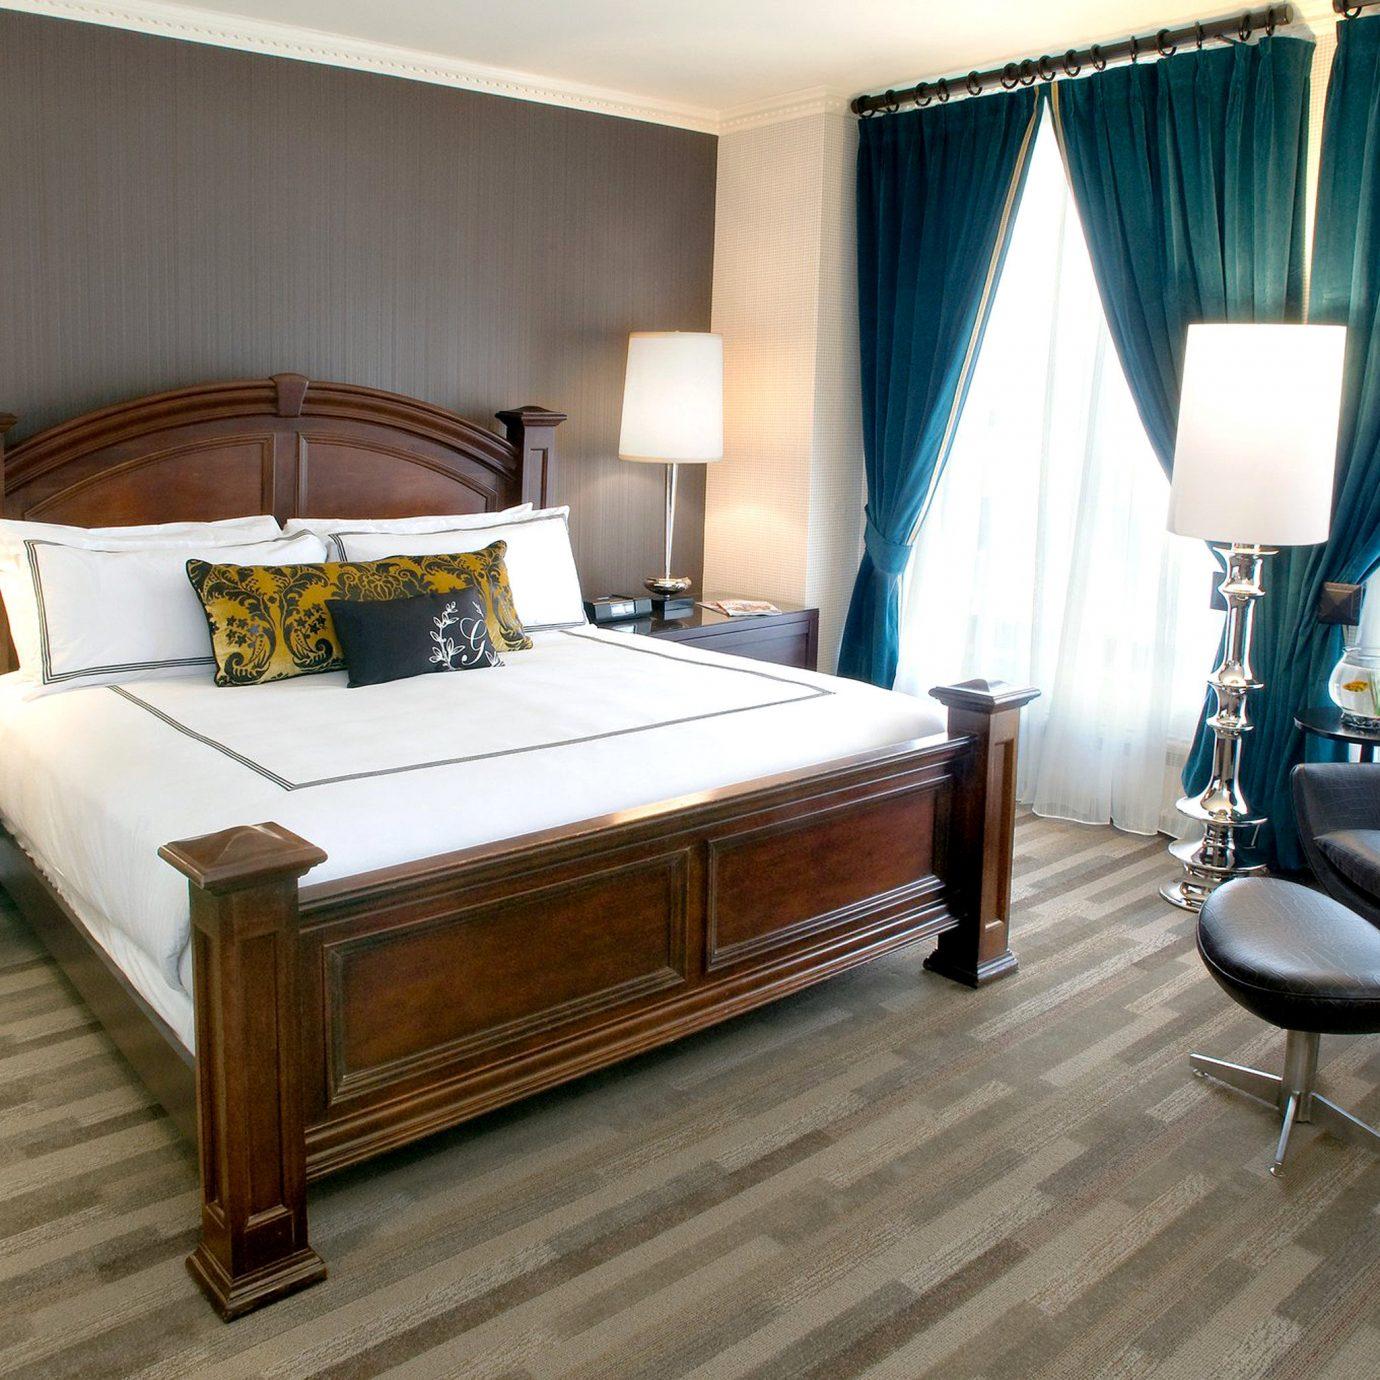 Bedroom City Modern property Suite curtain hardwood living room